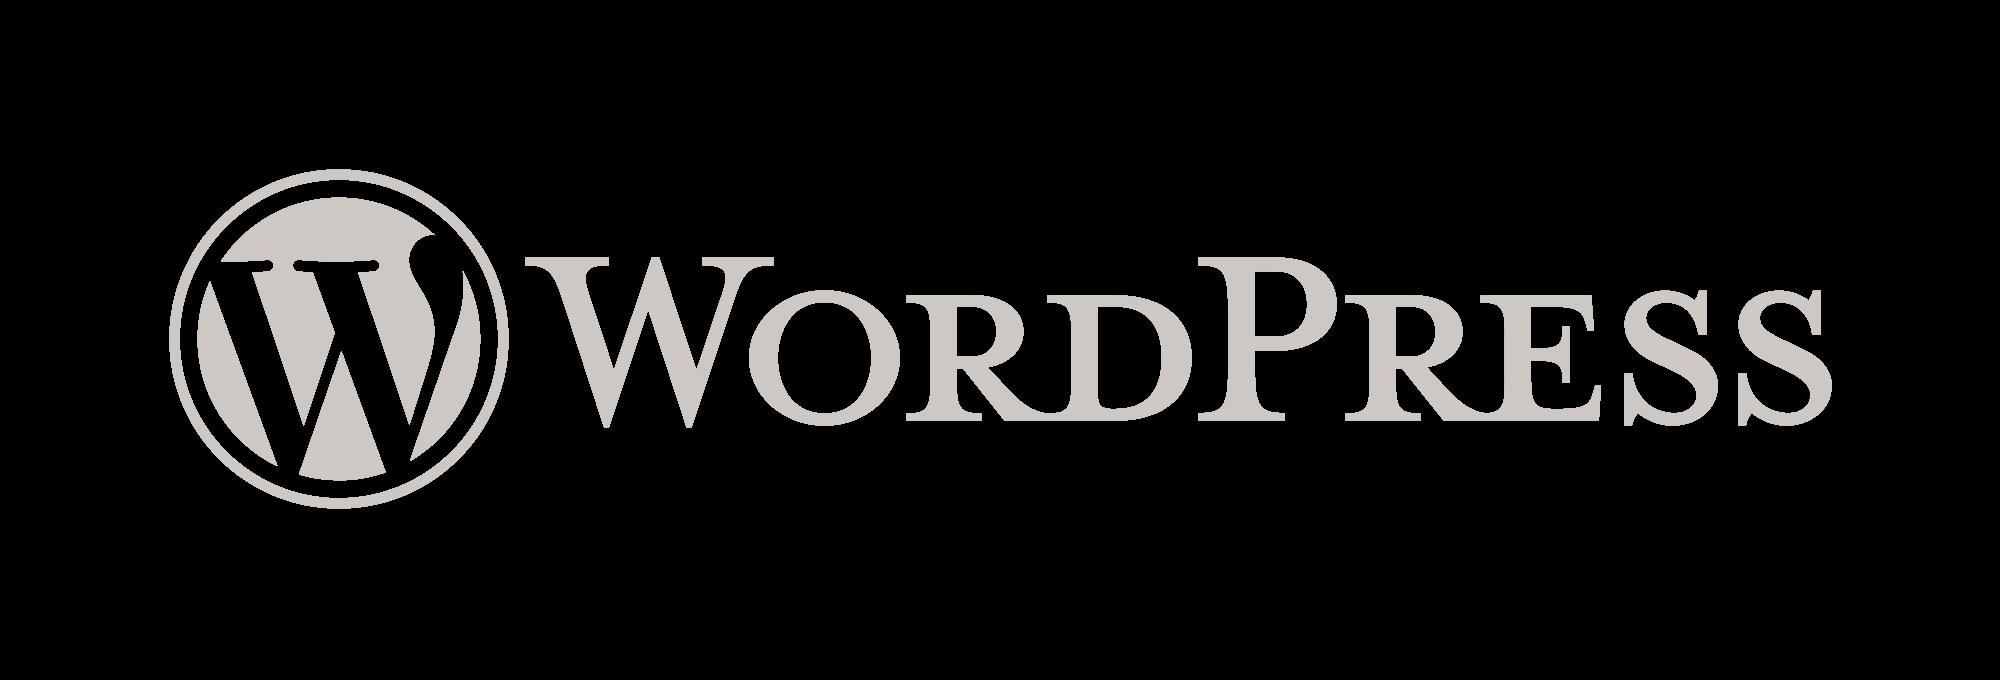 Wordpress.org logo white